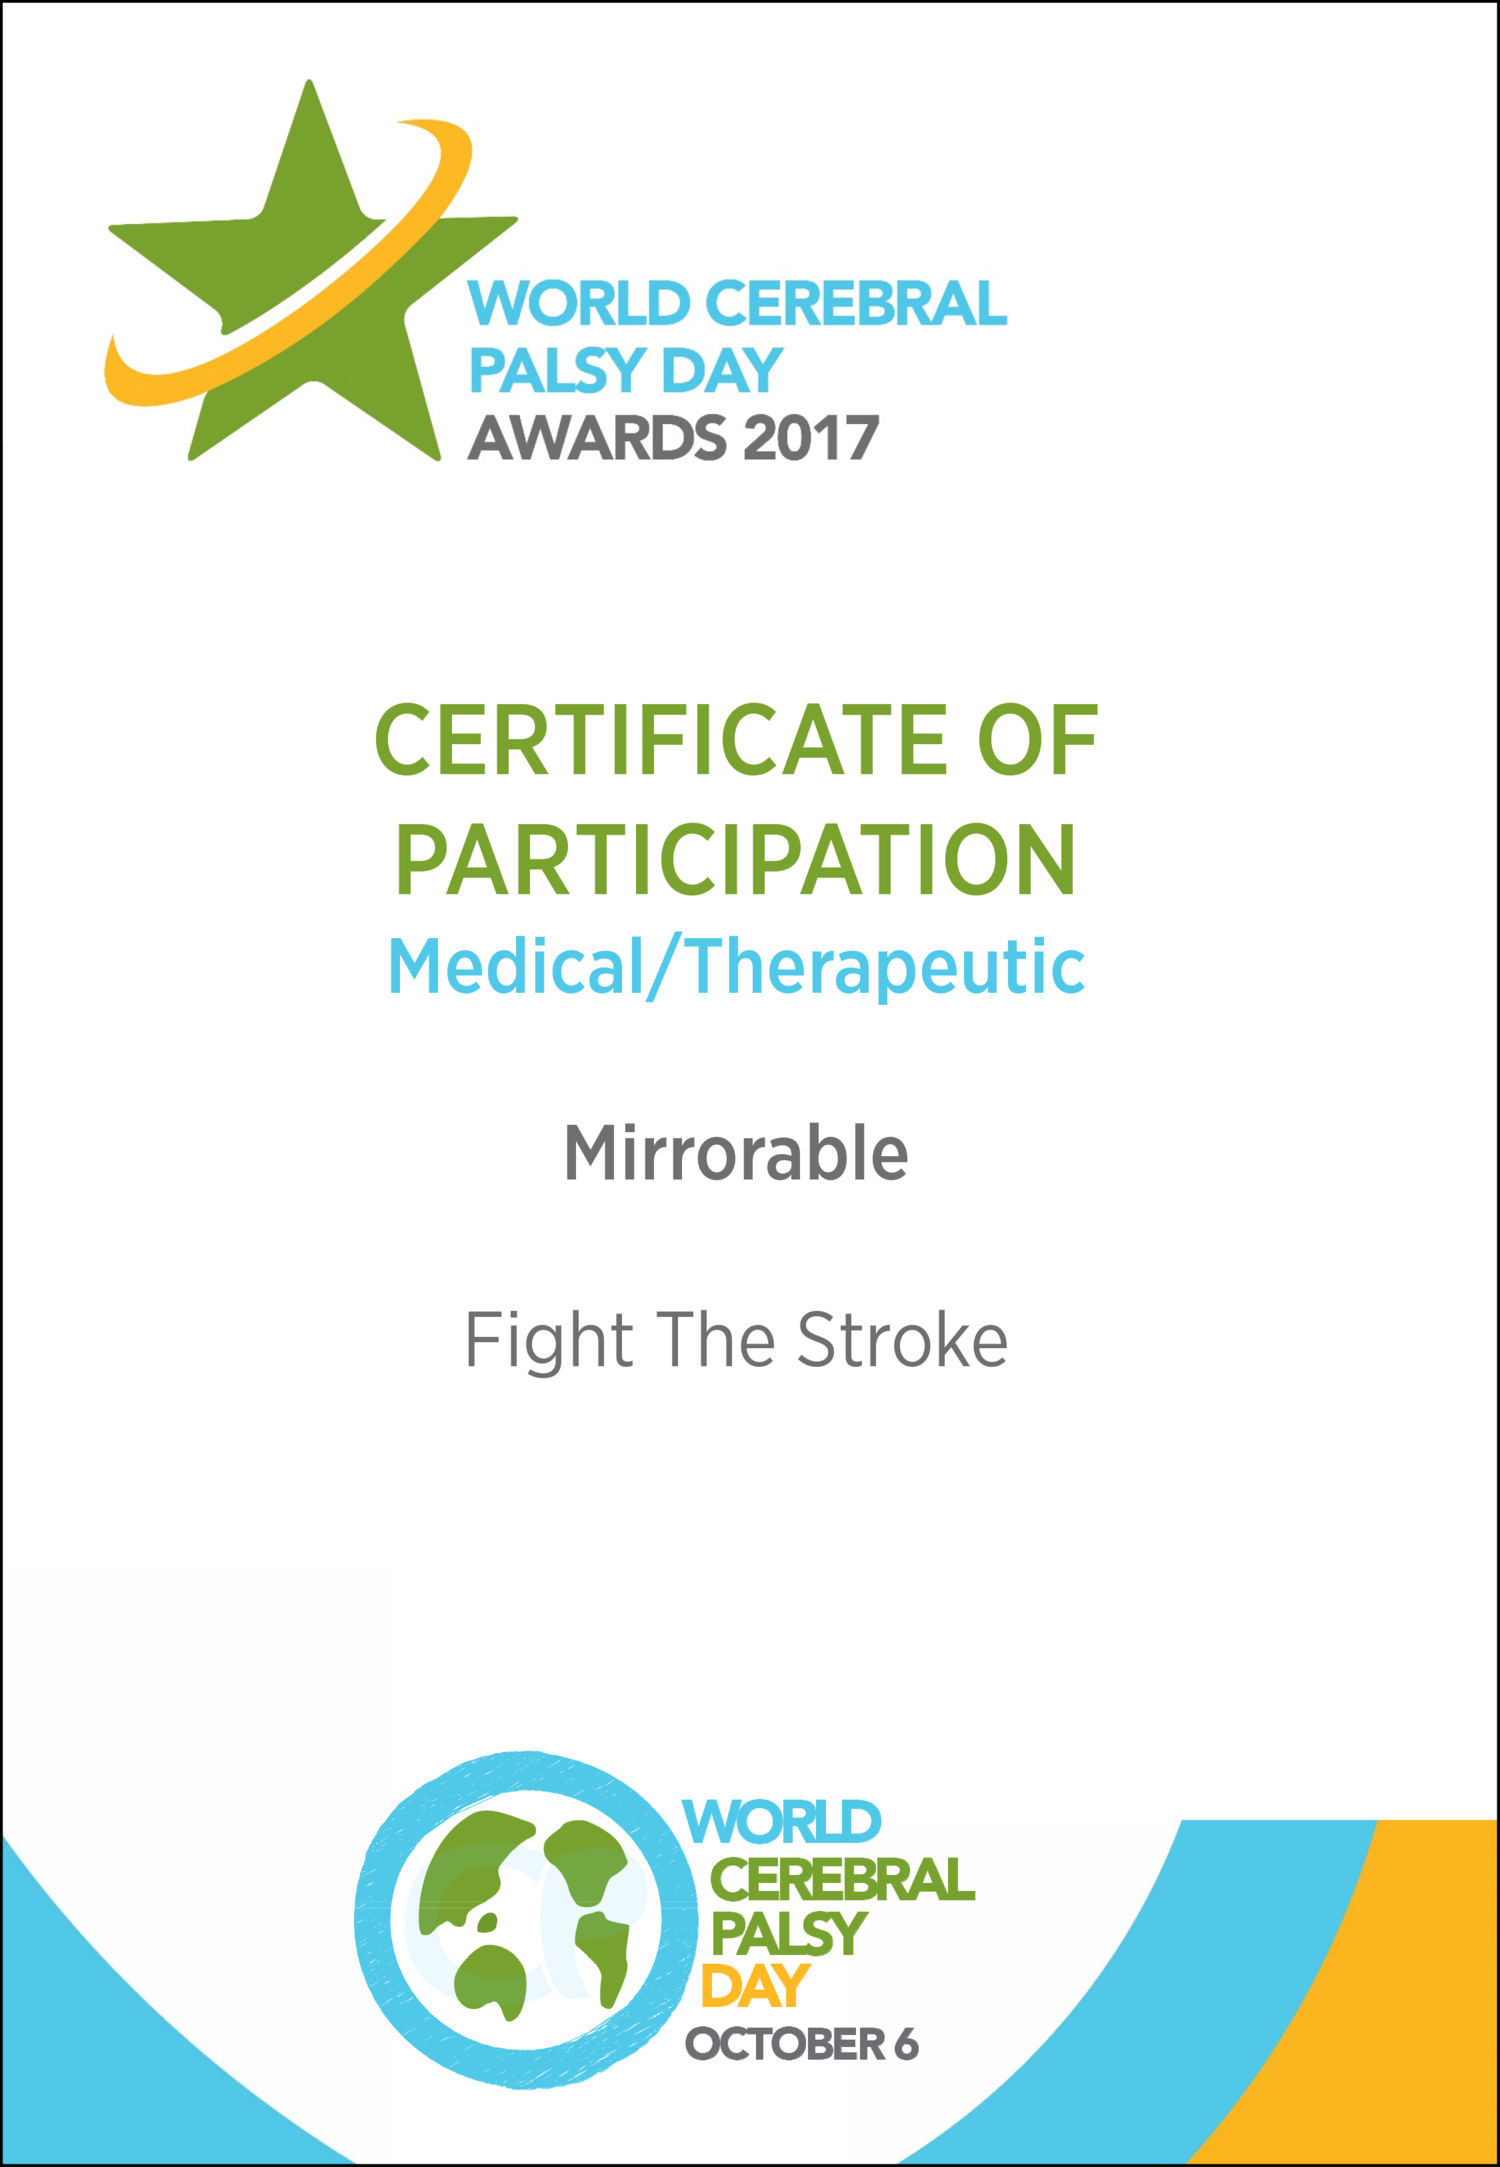 World Cerebral Palsy Day Awards 2017